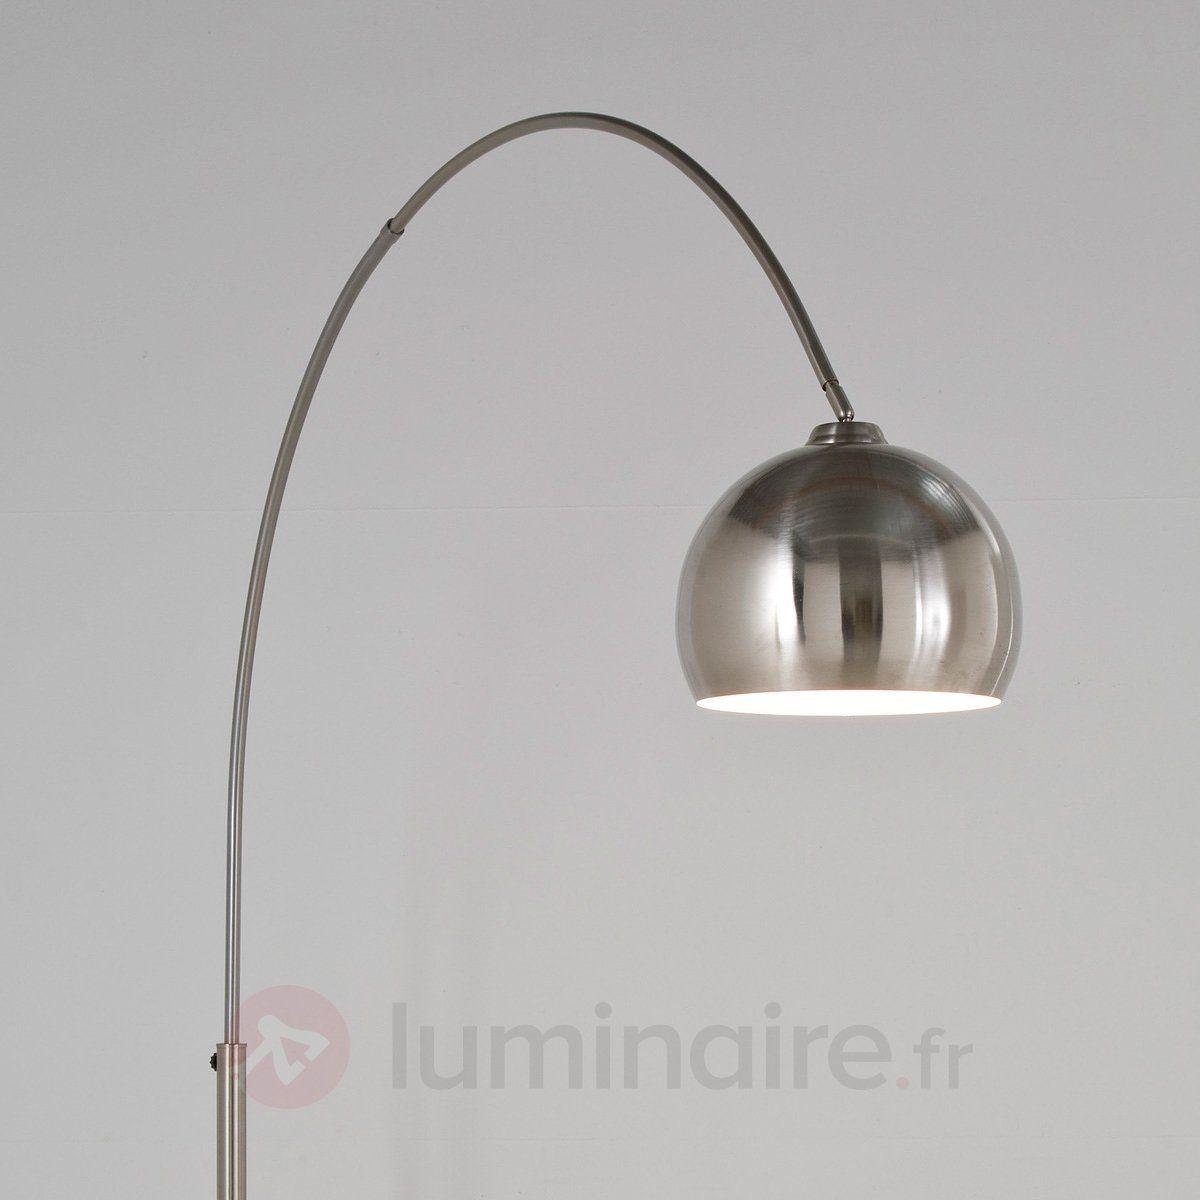 lampadaire arqu lounge satin lampadaire pas cher. Black Bedroom Furniture Sets. Home Design Ideas